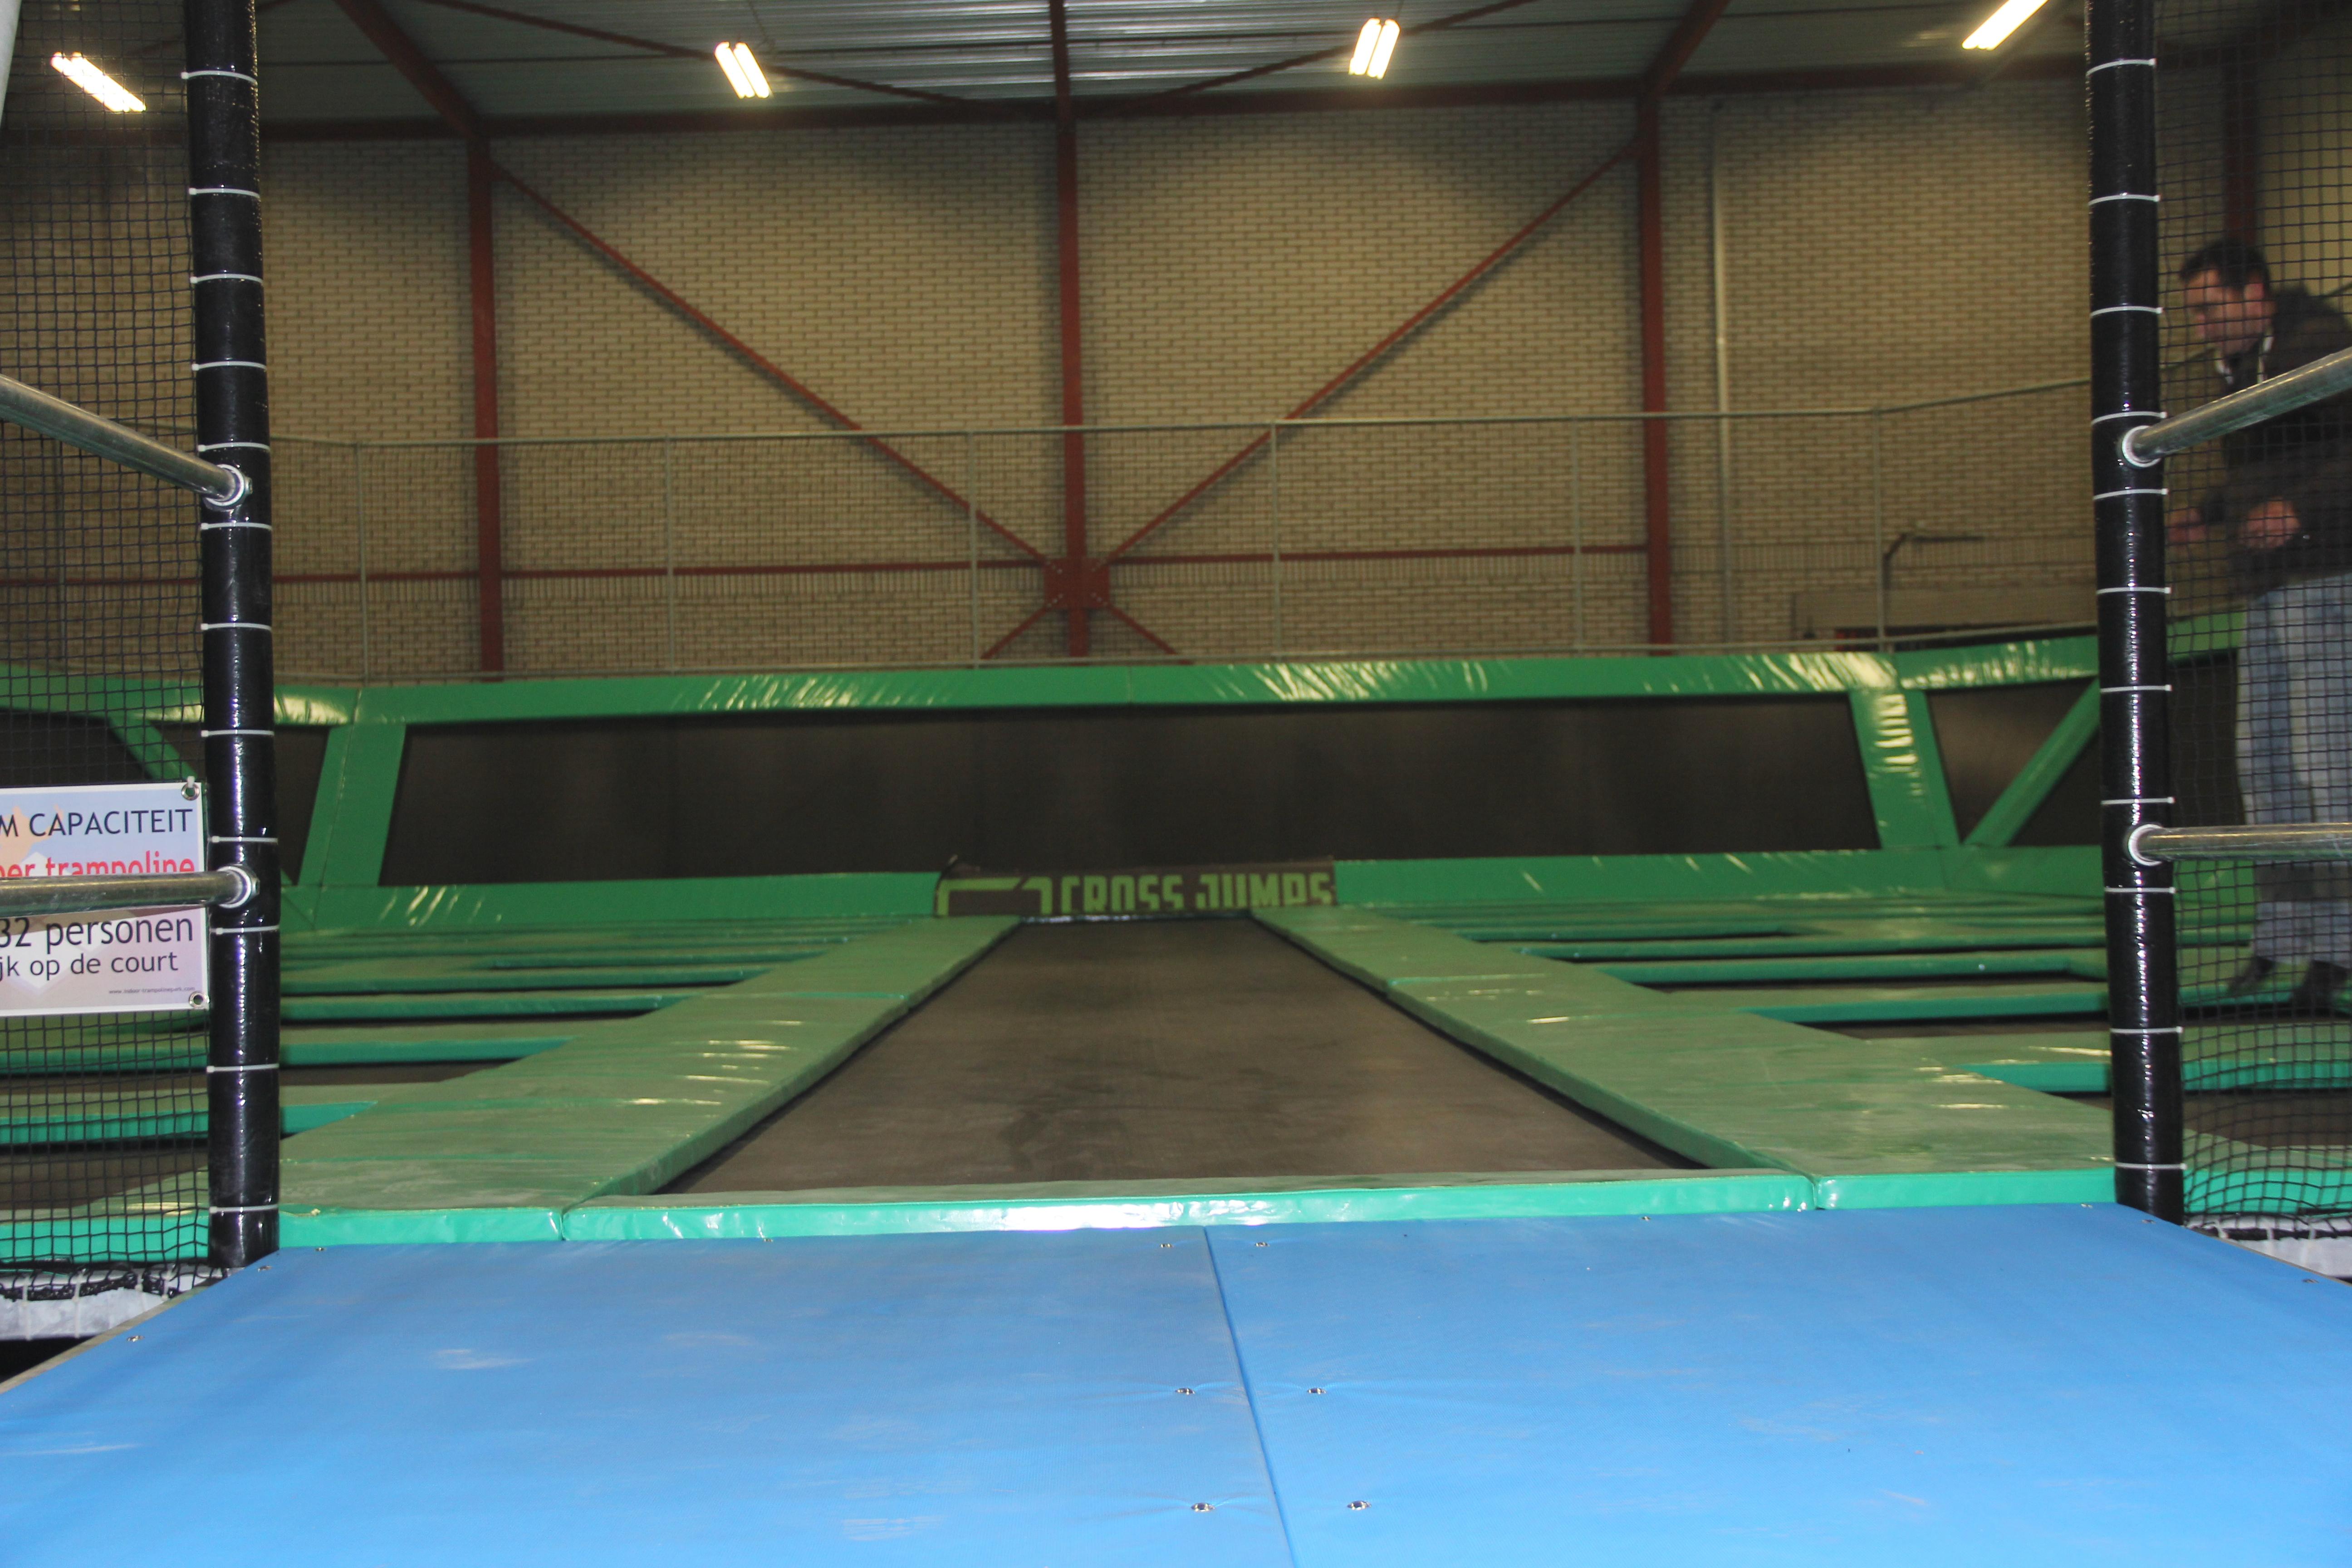 Indoor trampoline park breda 2014 again a hajump creation for Indoor trampoline park design manufacturing